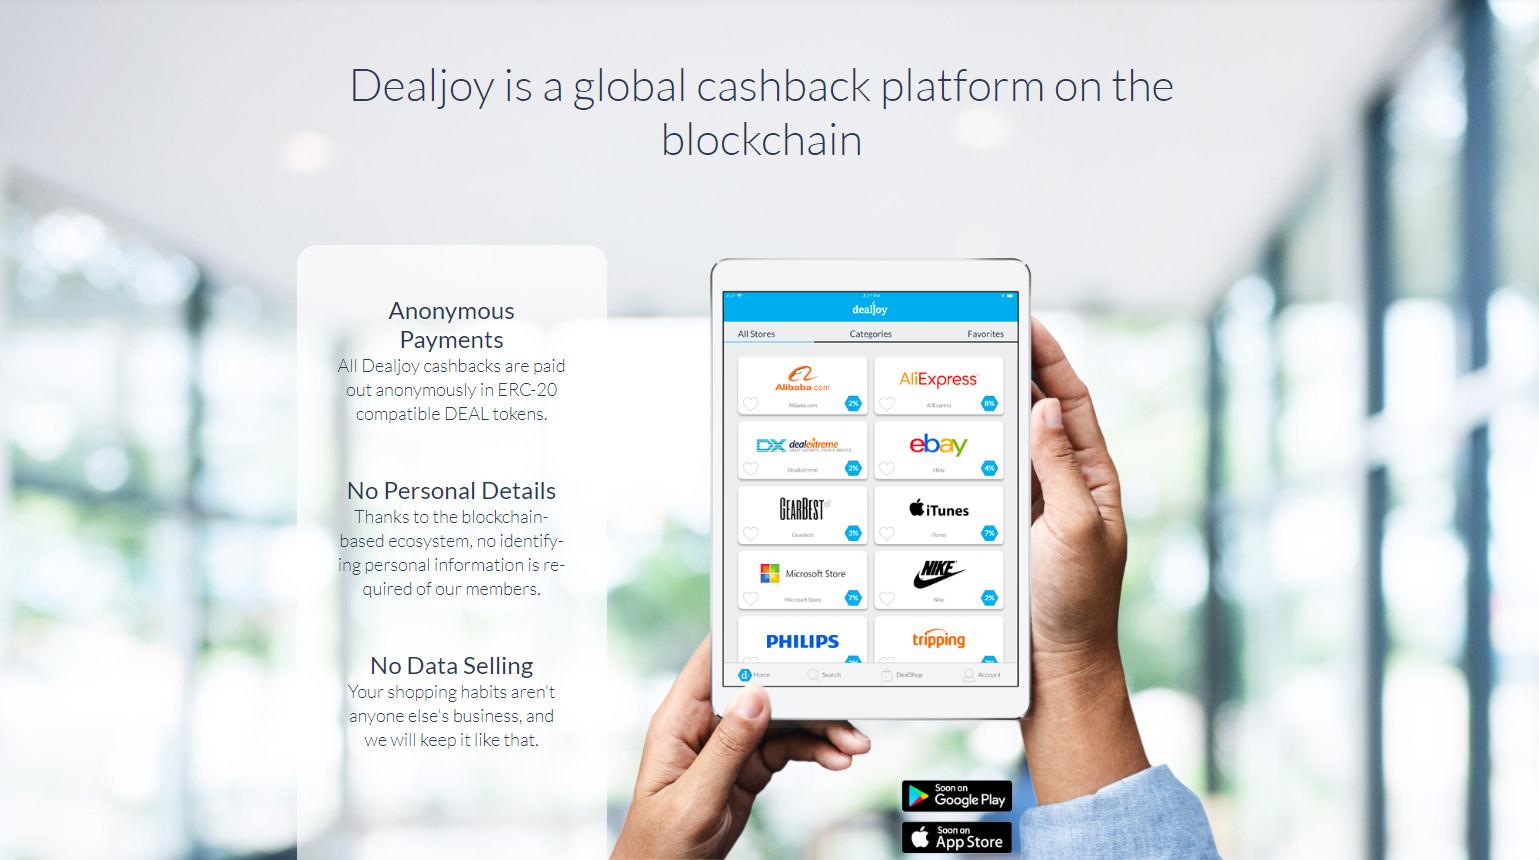 dealjoy global cashback